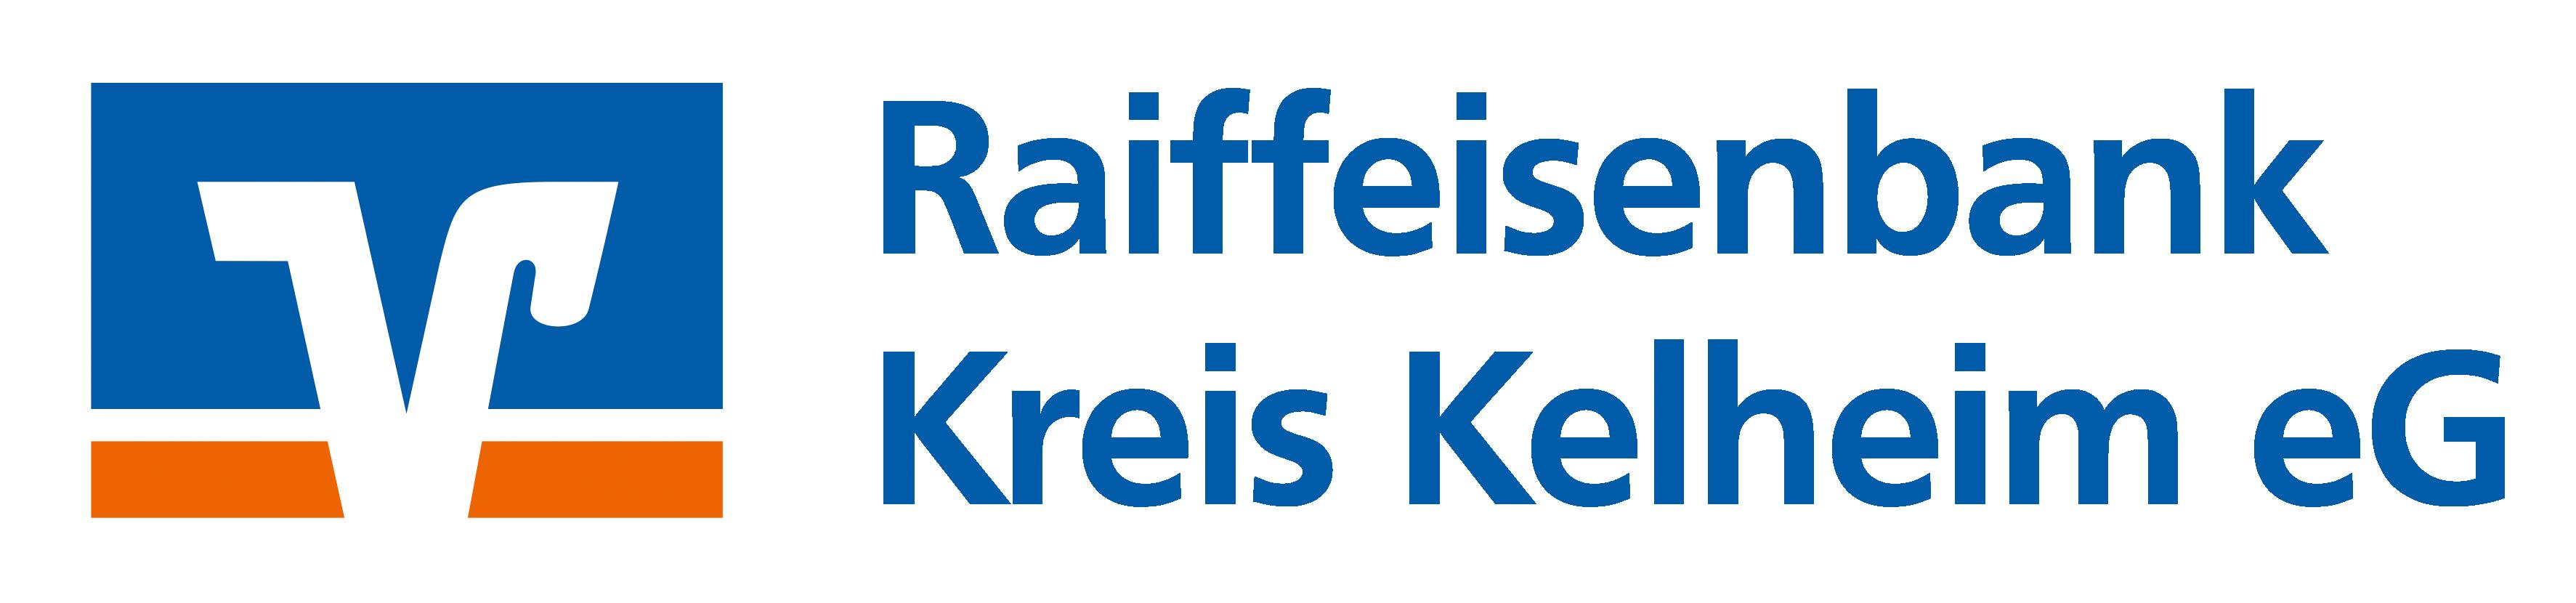 Presse - Raiffeisenbank Kreis Kelheim eG